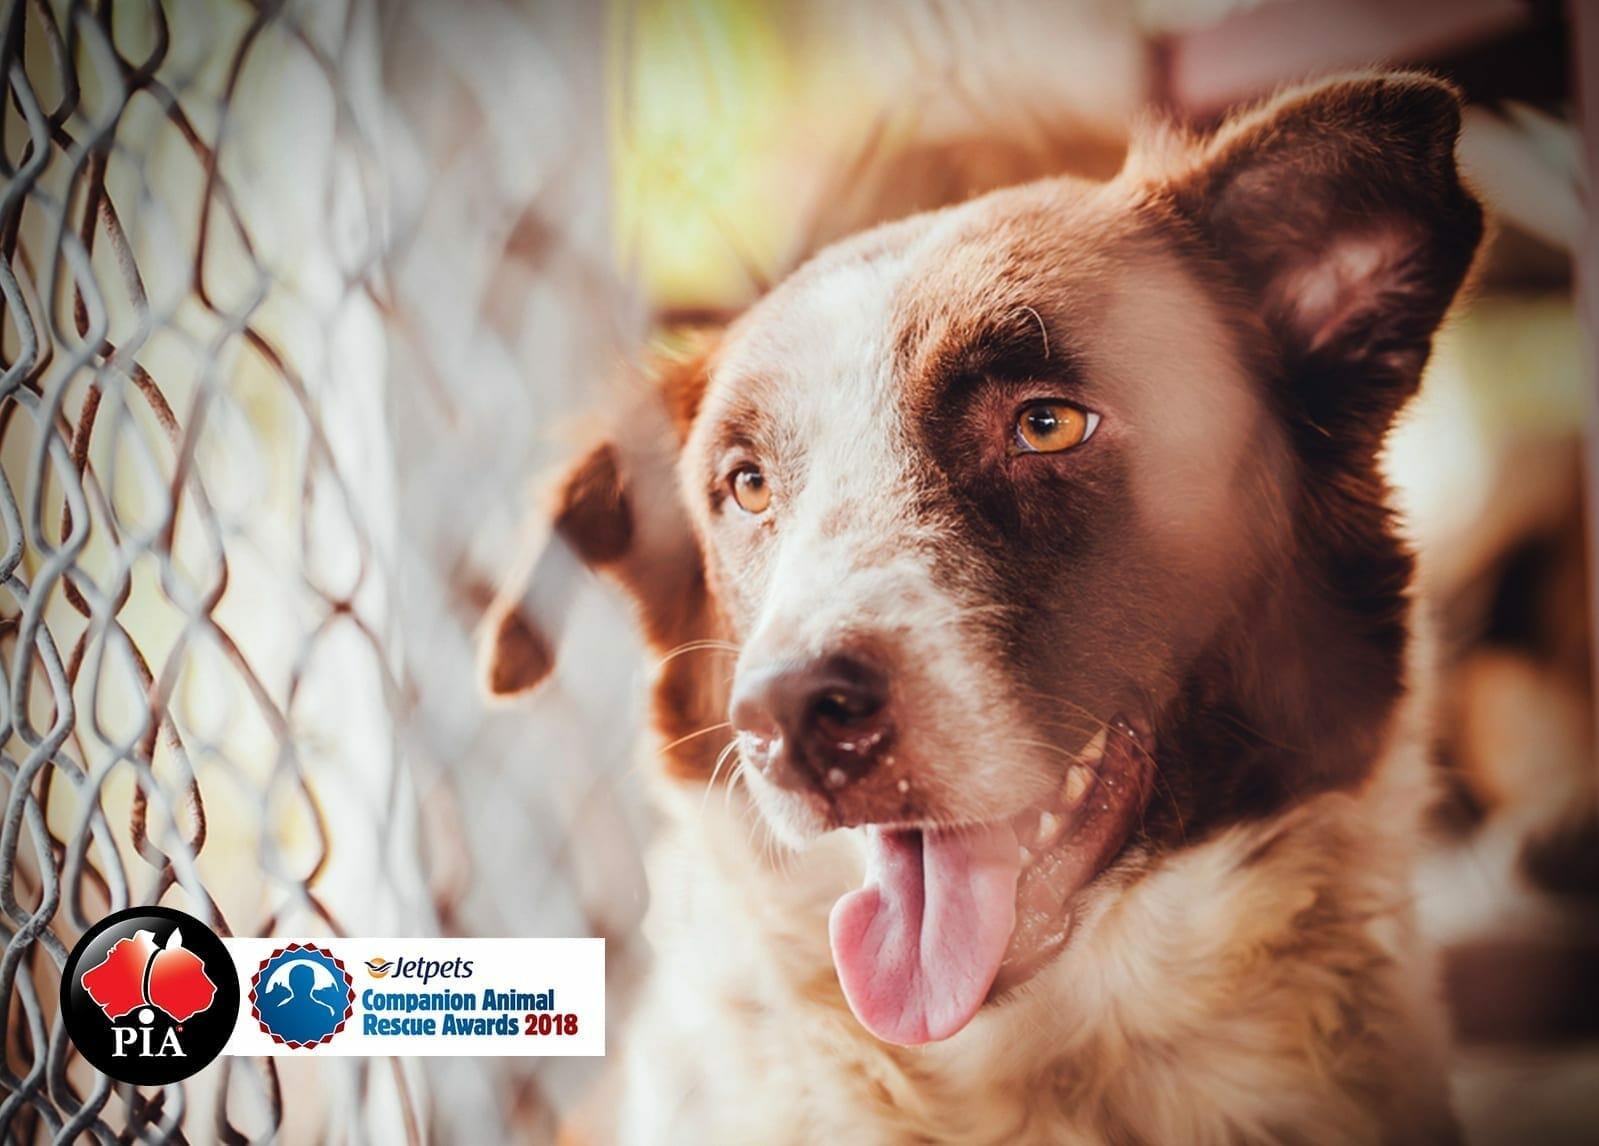 Dog Rescue Organisations Australia